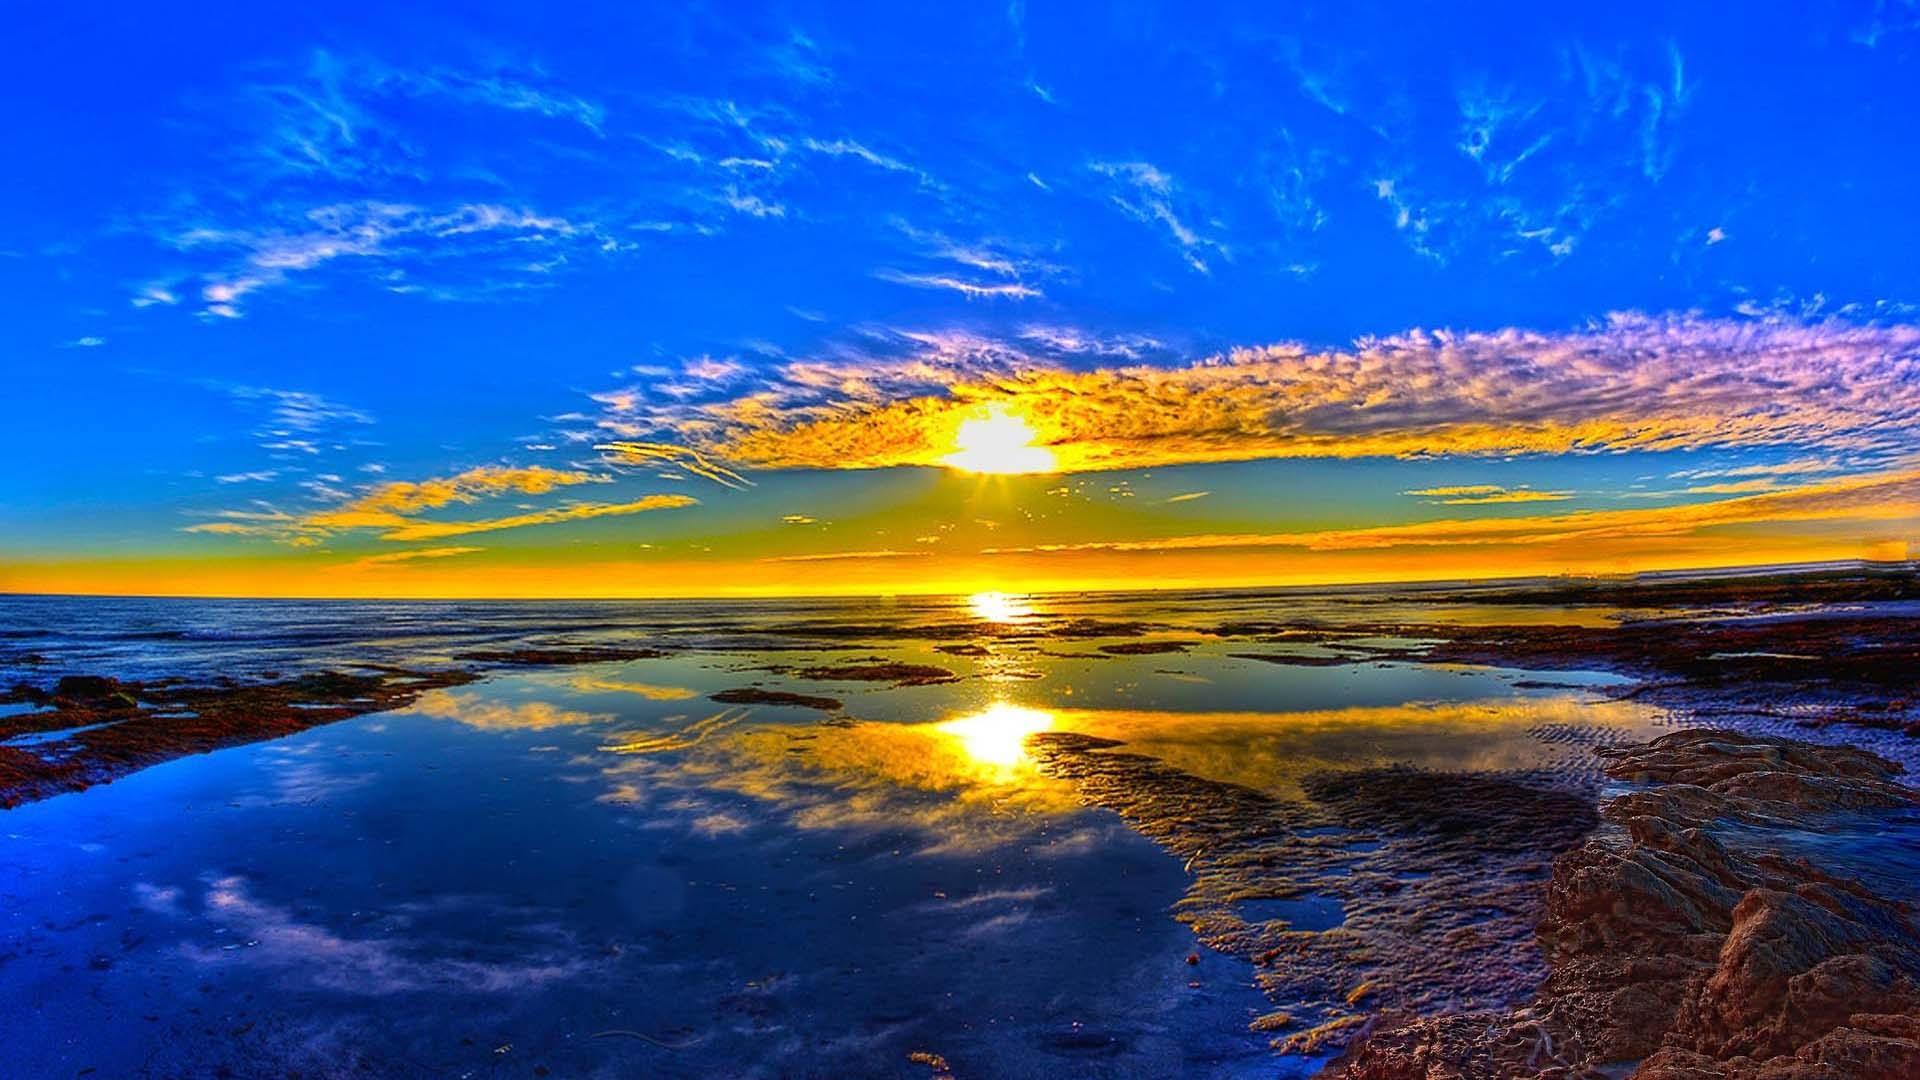 sunrise wallpaper hd,sky,nature,natural landscape,horizon,reflection